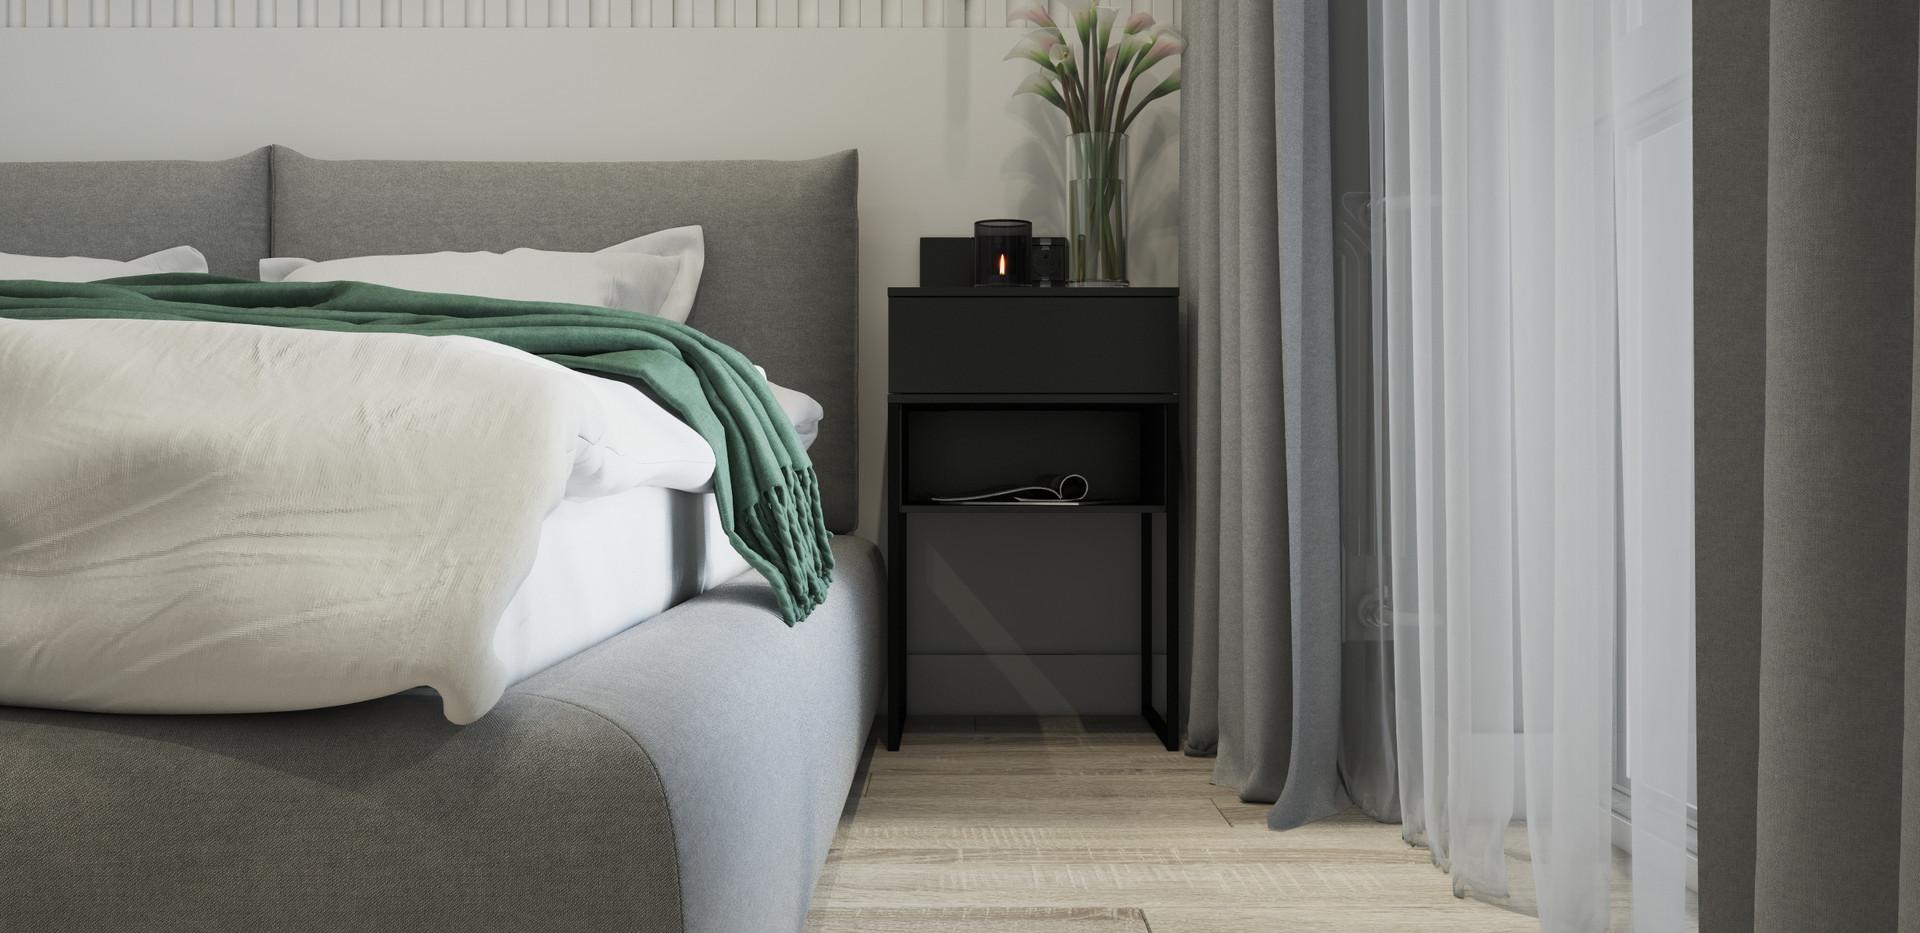 Bedroom in minimalism